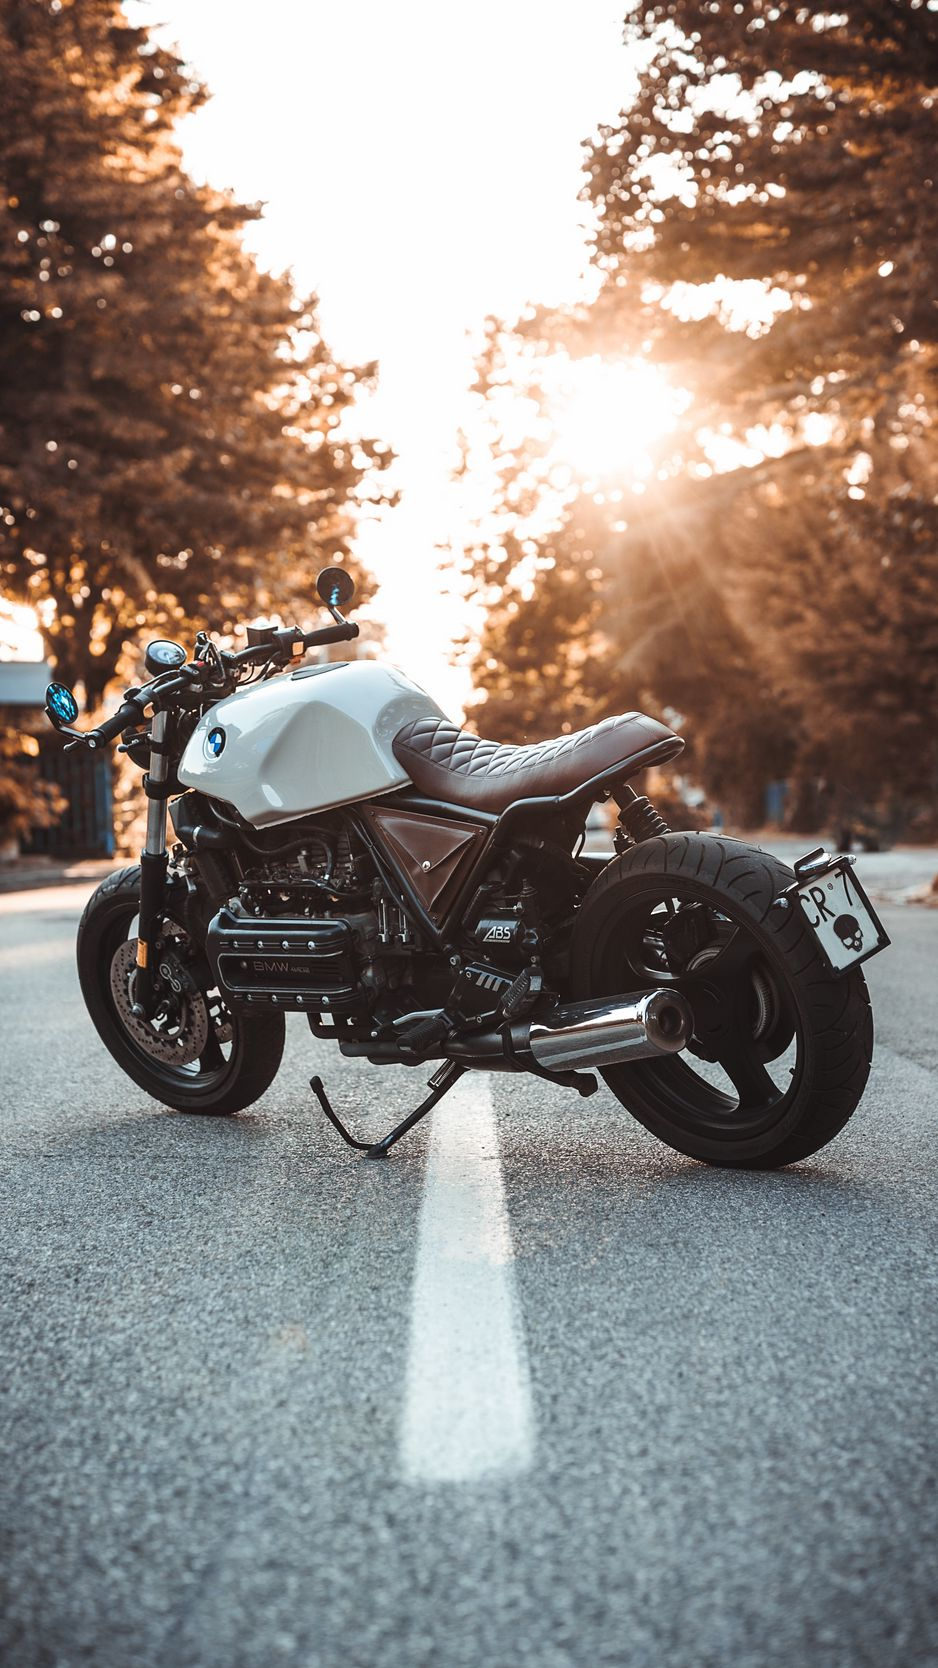 938x1668 Обои bmw k100, мотоцикл, байк, вид сбоку